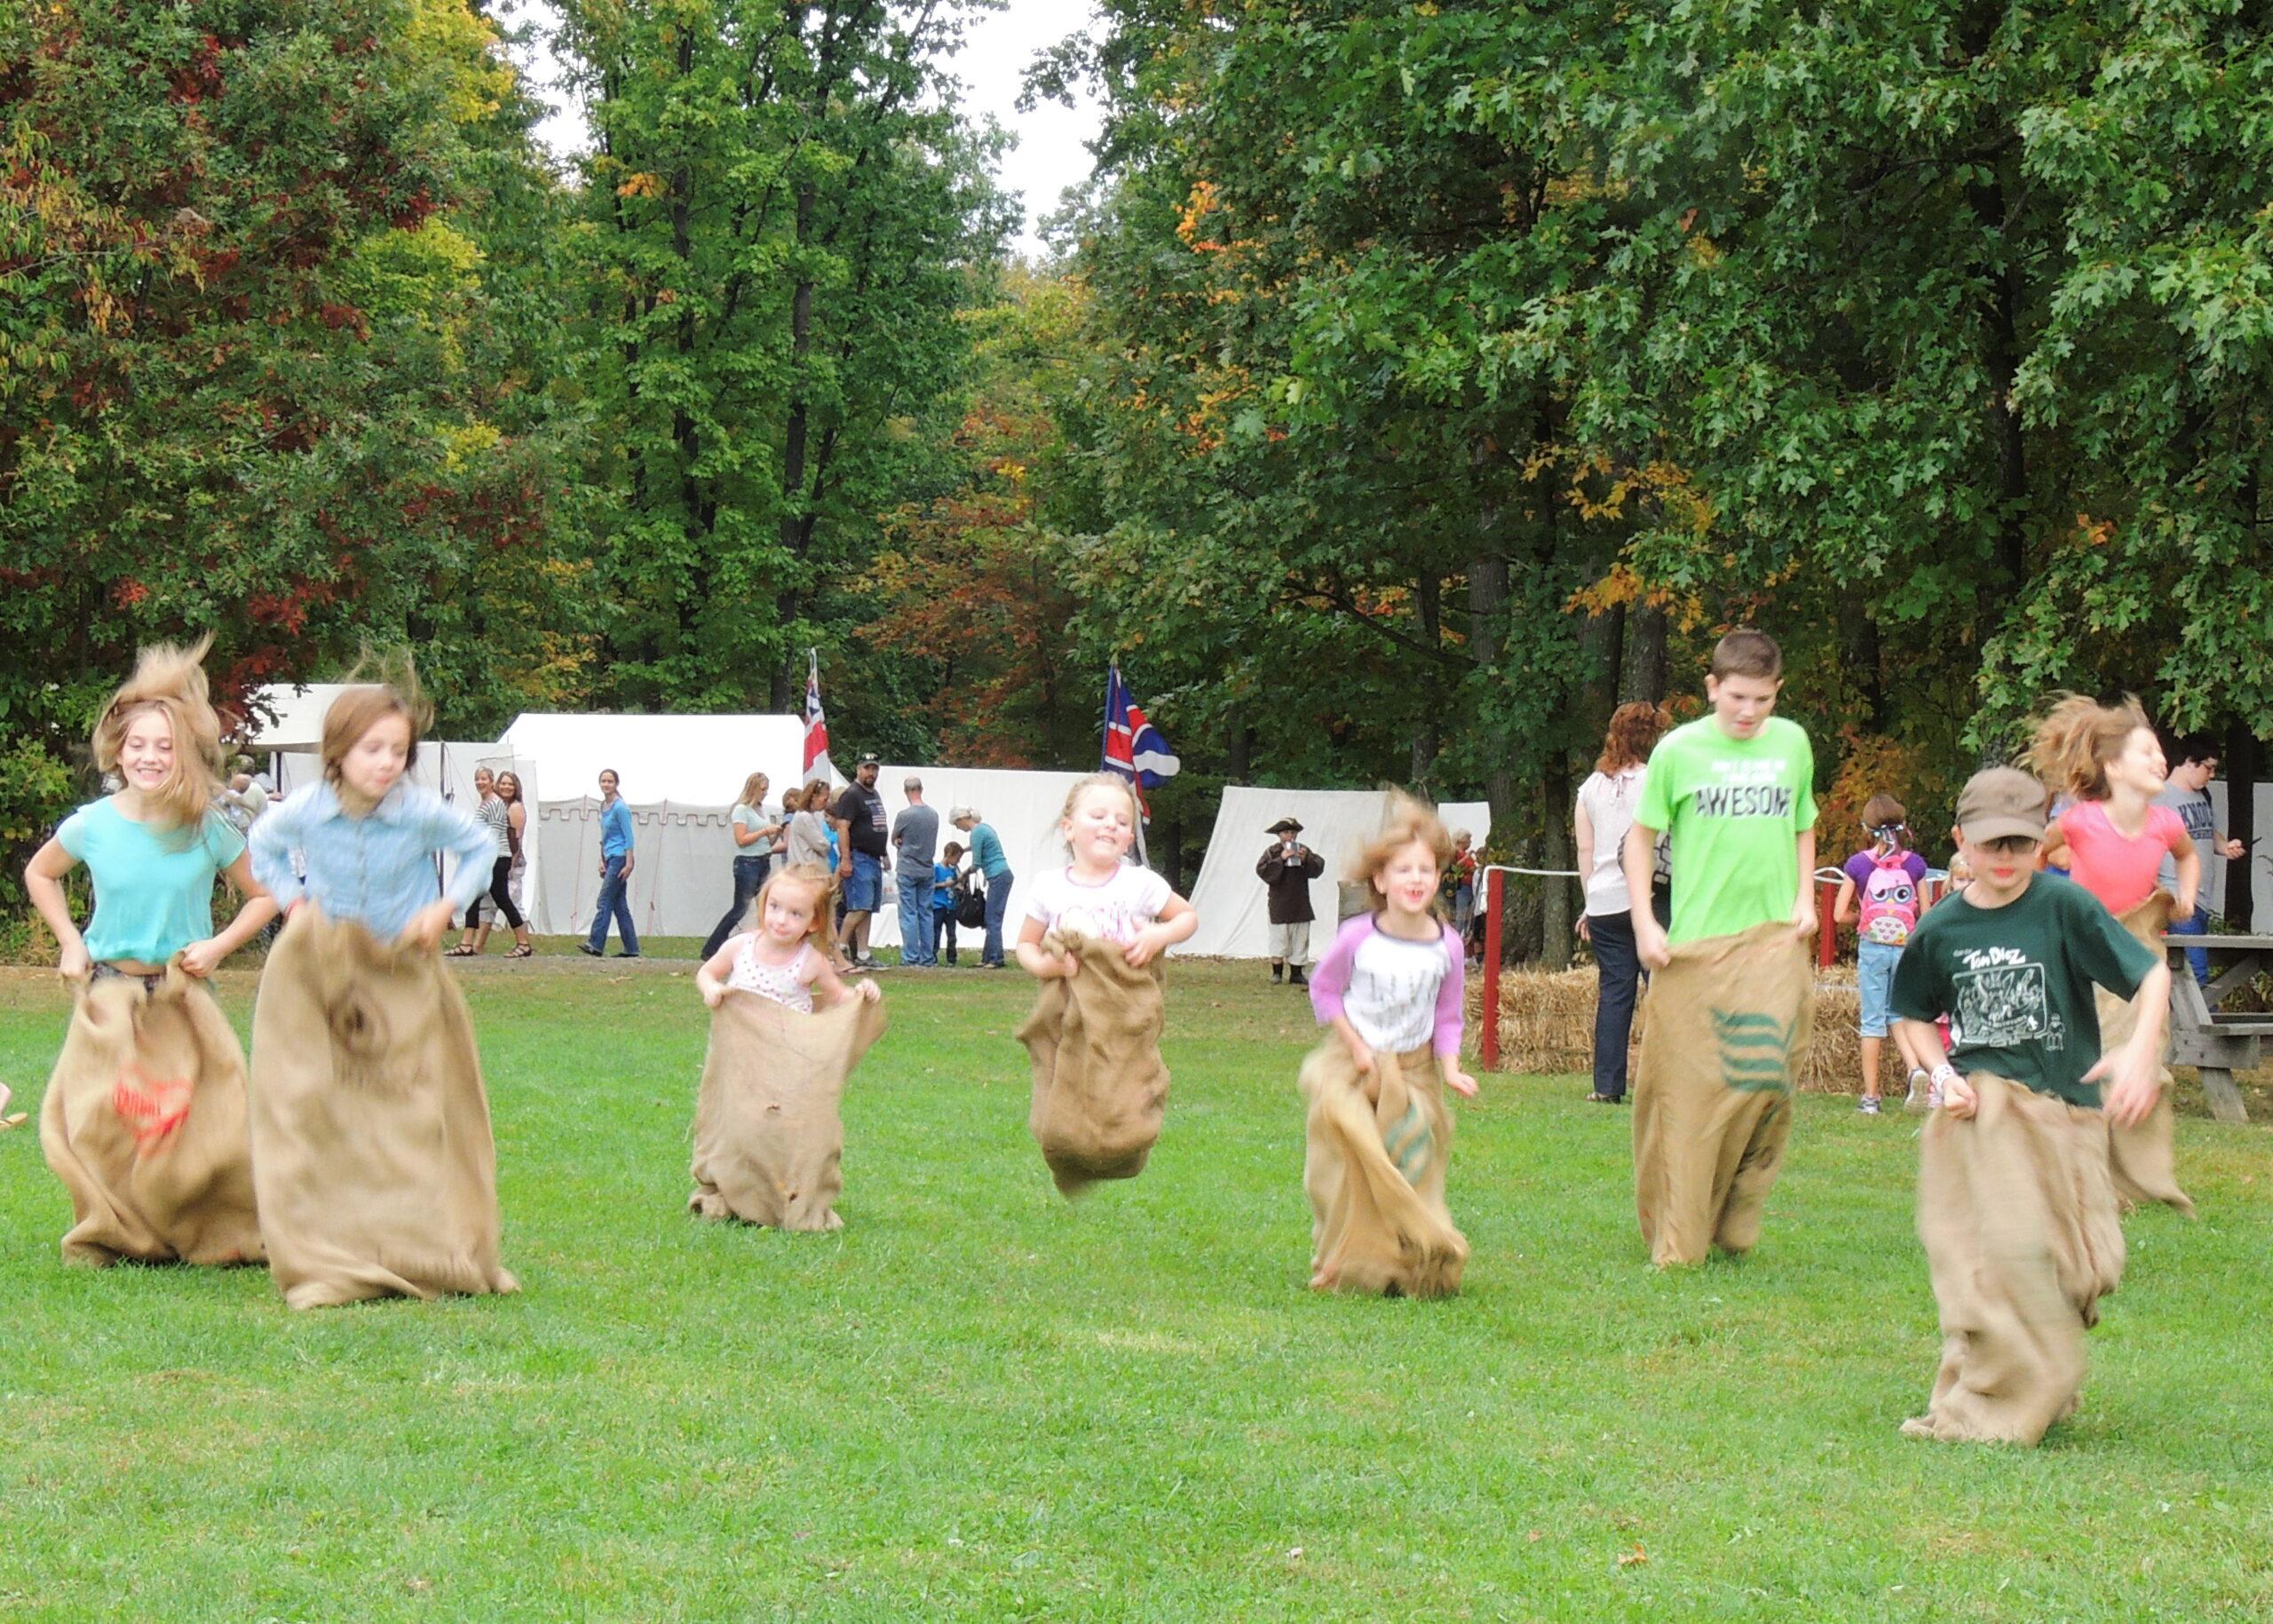 children in a potato sack race